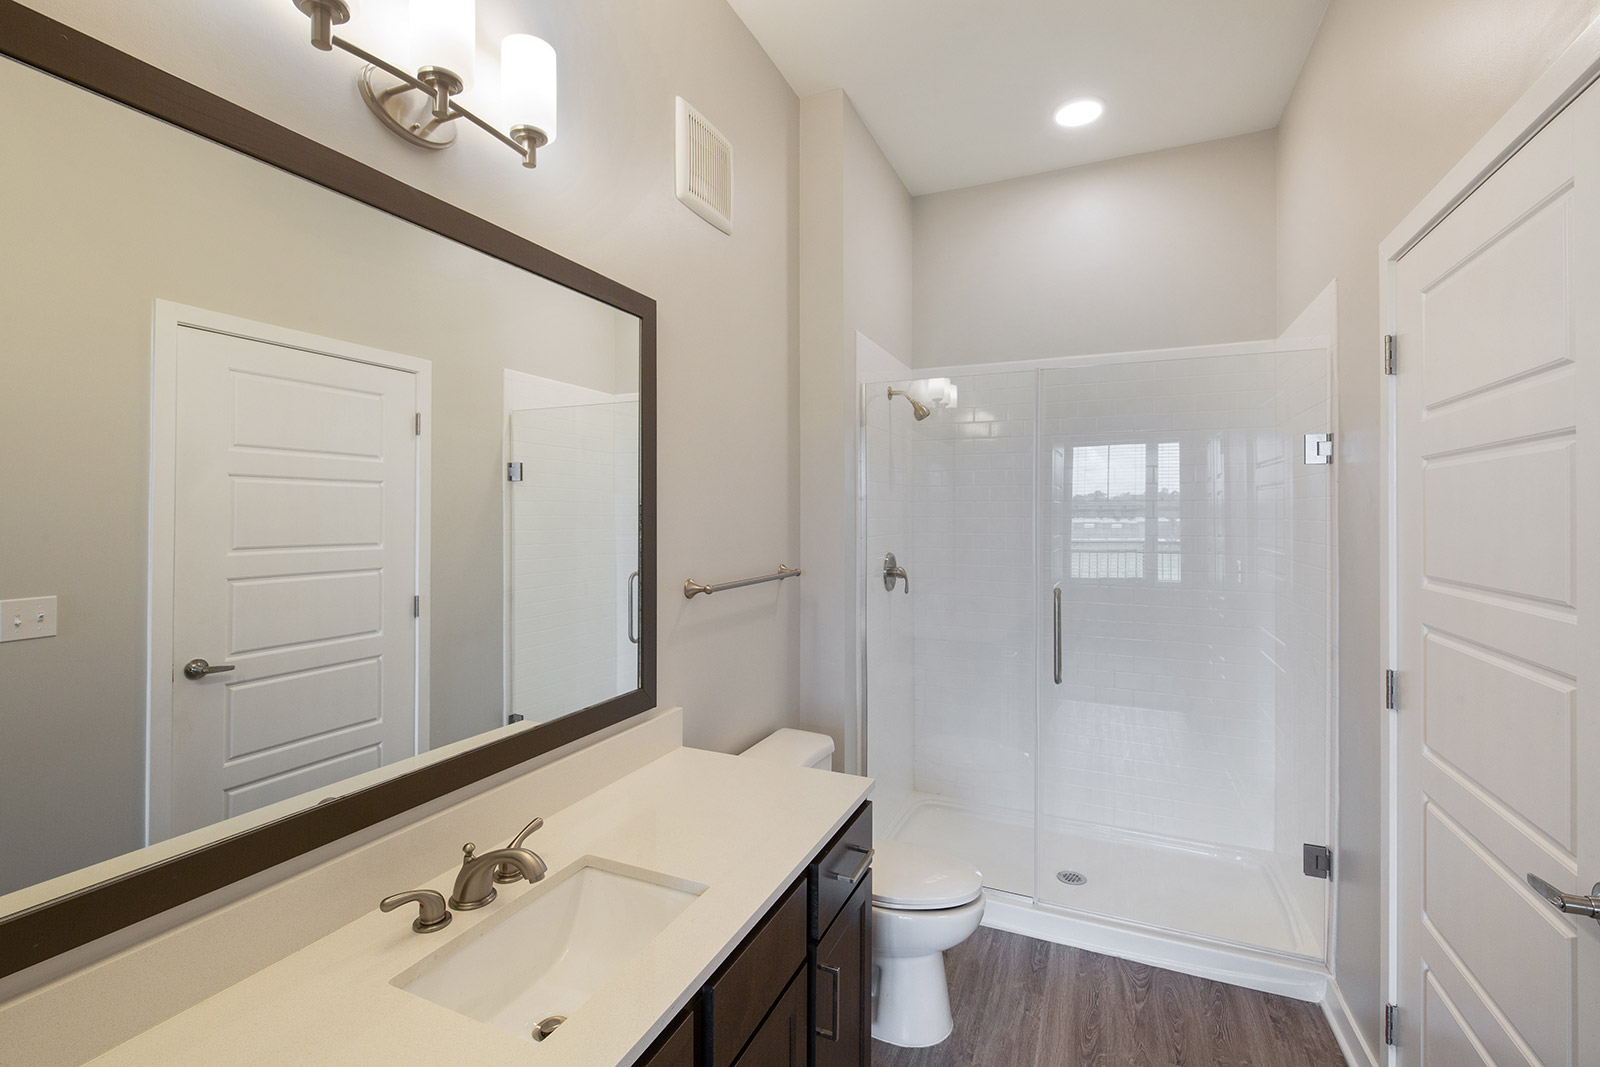 Bathroom Interior at Sawgrass Point in Gonzales, Louisiana